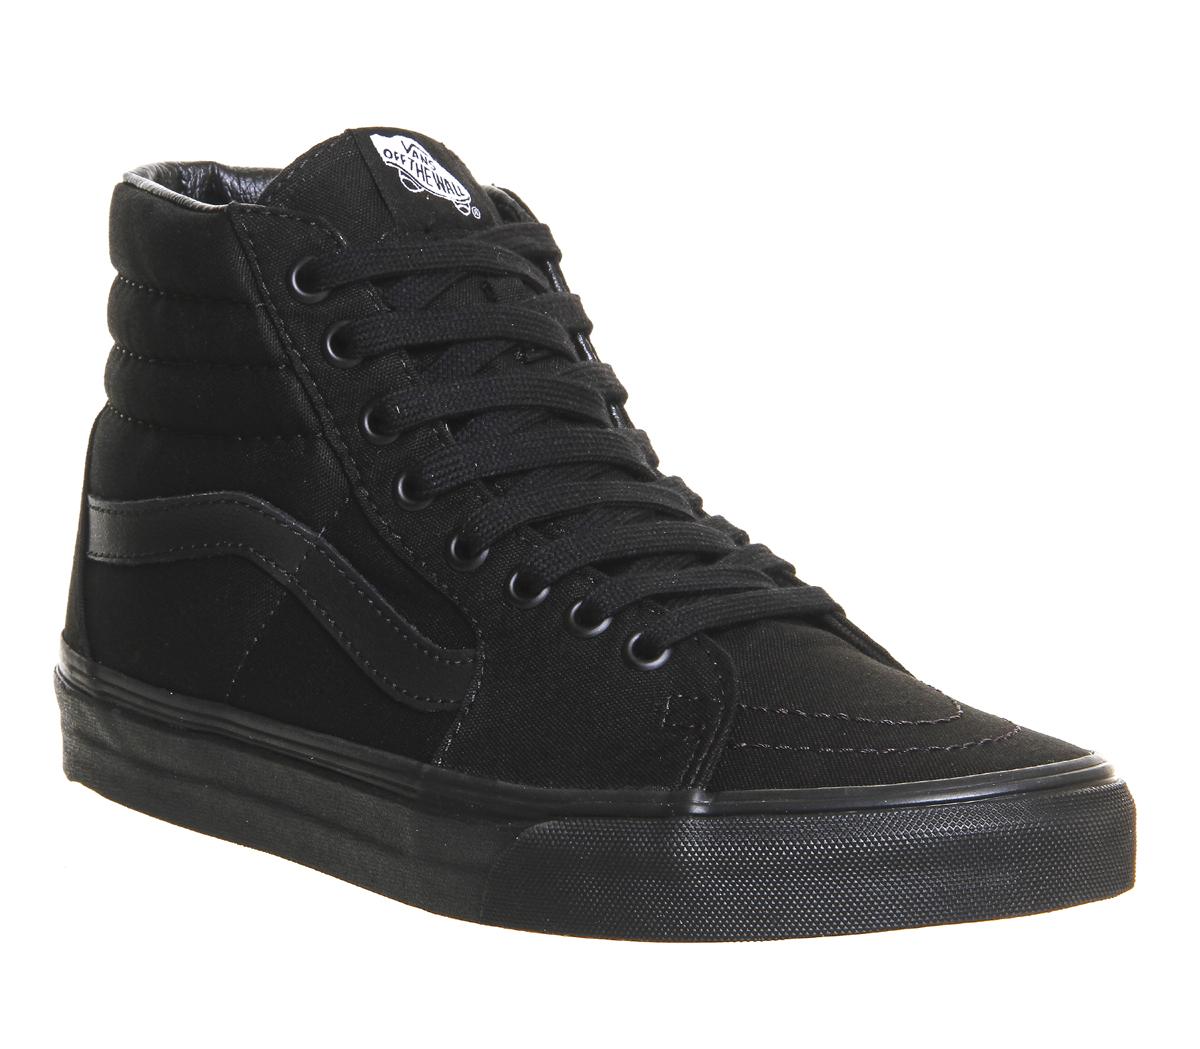 scarpe vans nero donna alte